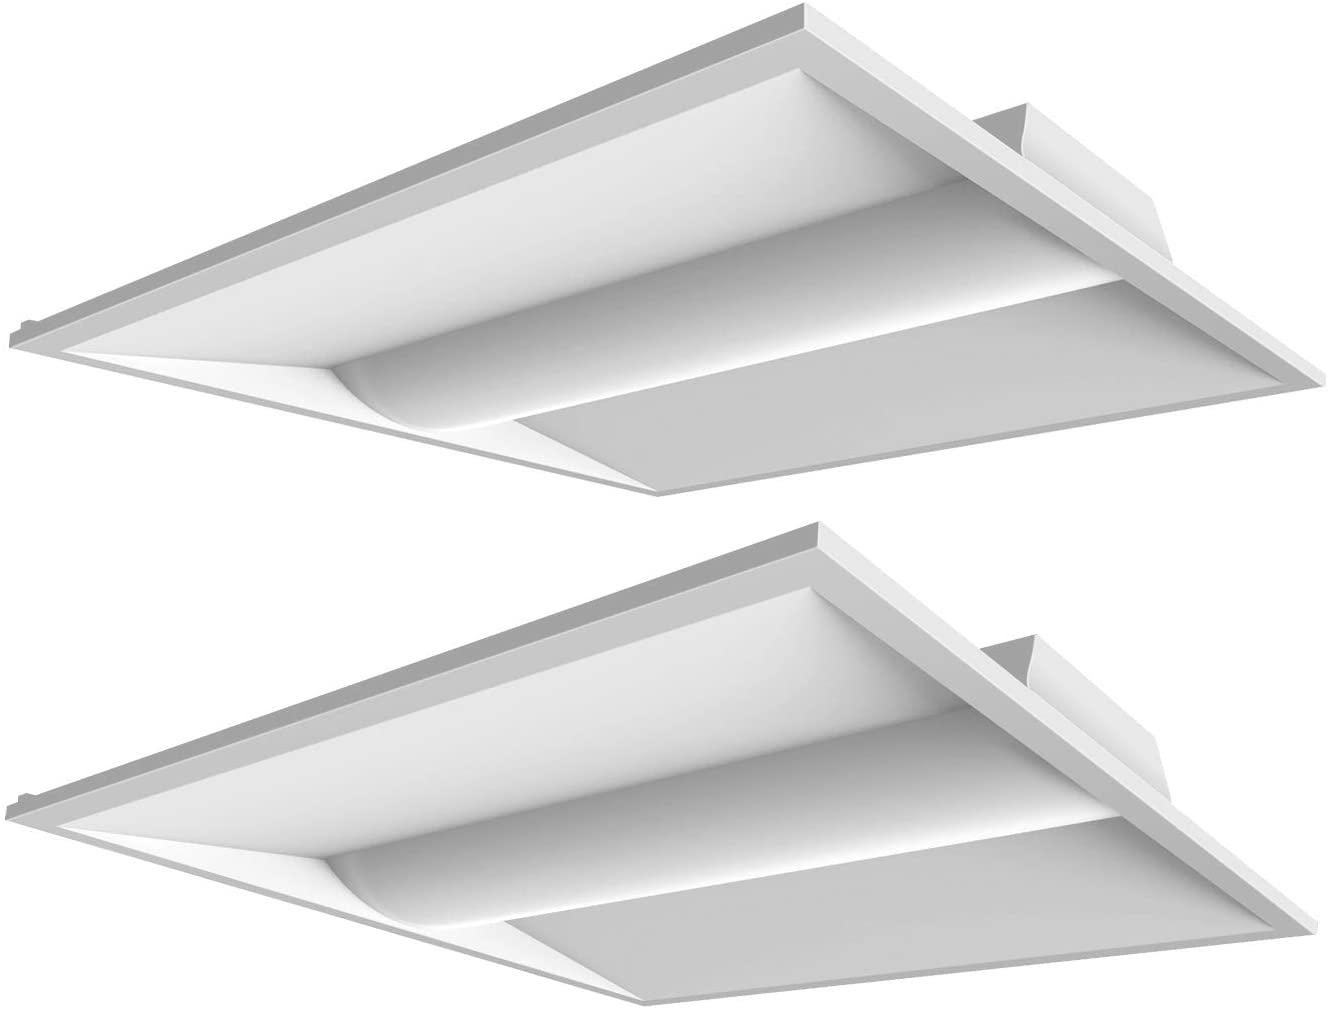 2PCS 2x2 FT LED Troffer 26W Light Fixture for Office Hospital 3250LM 4000K 0-10v Dim DLC UL Listed, 50,000 Life Hours (26W 4000K, 2x2 FT)